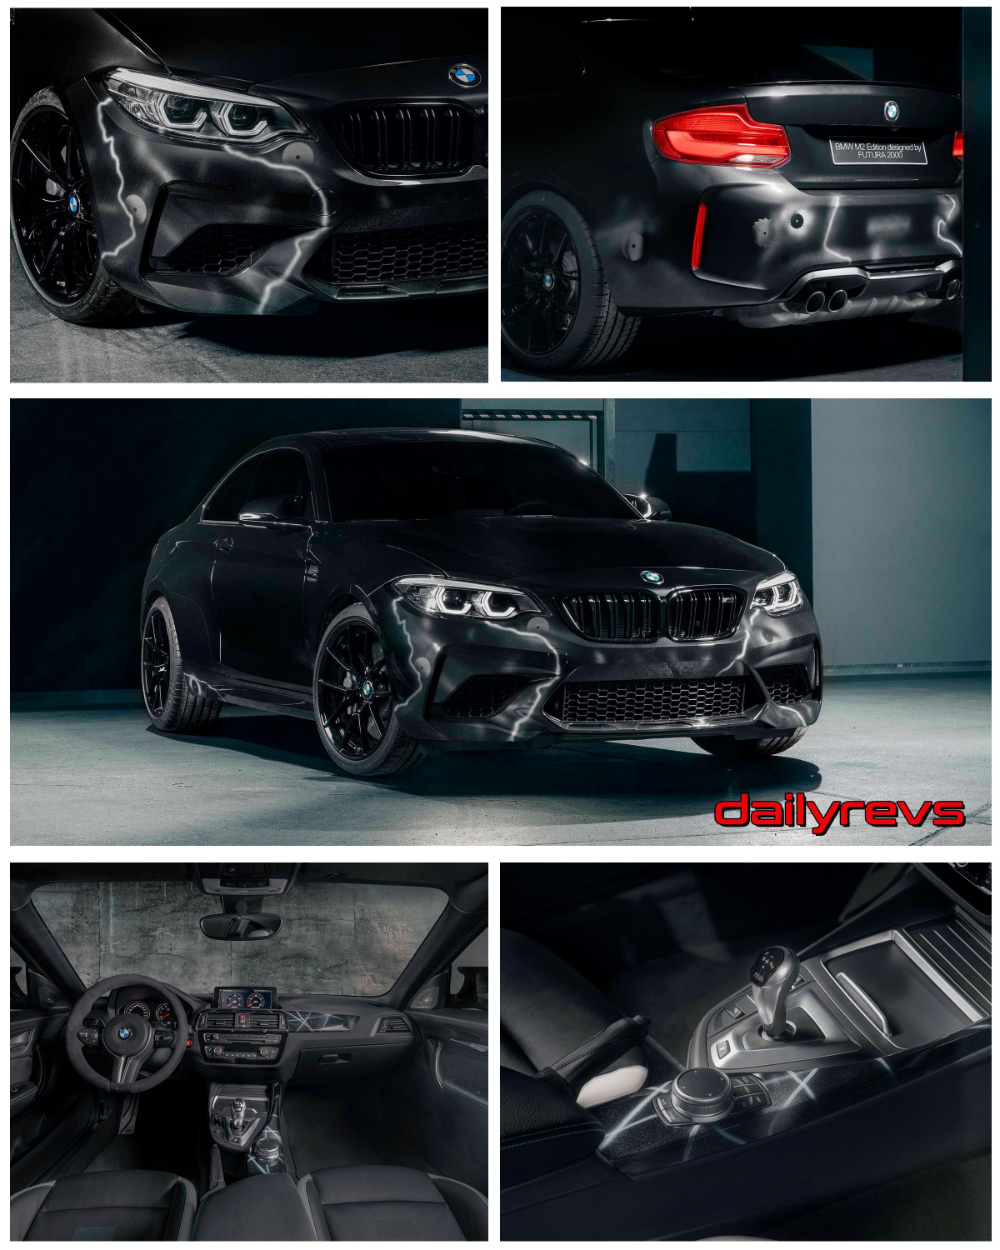 2020 BMW M2 by Futura 2000 in 2020 Bmw